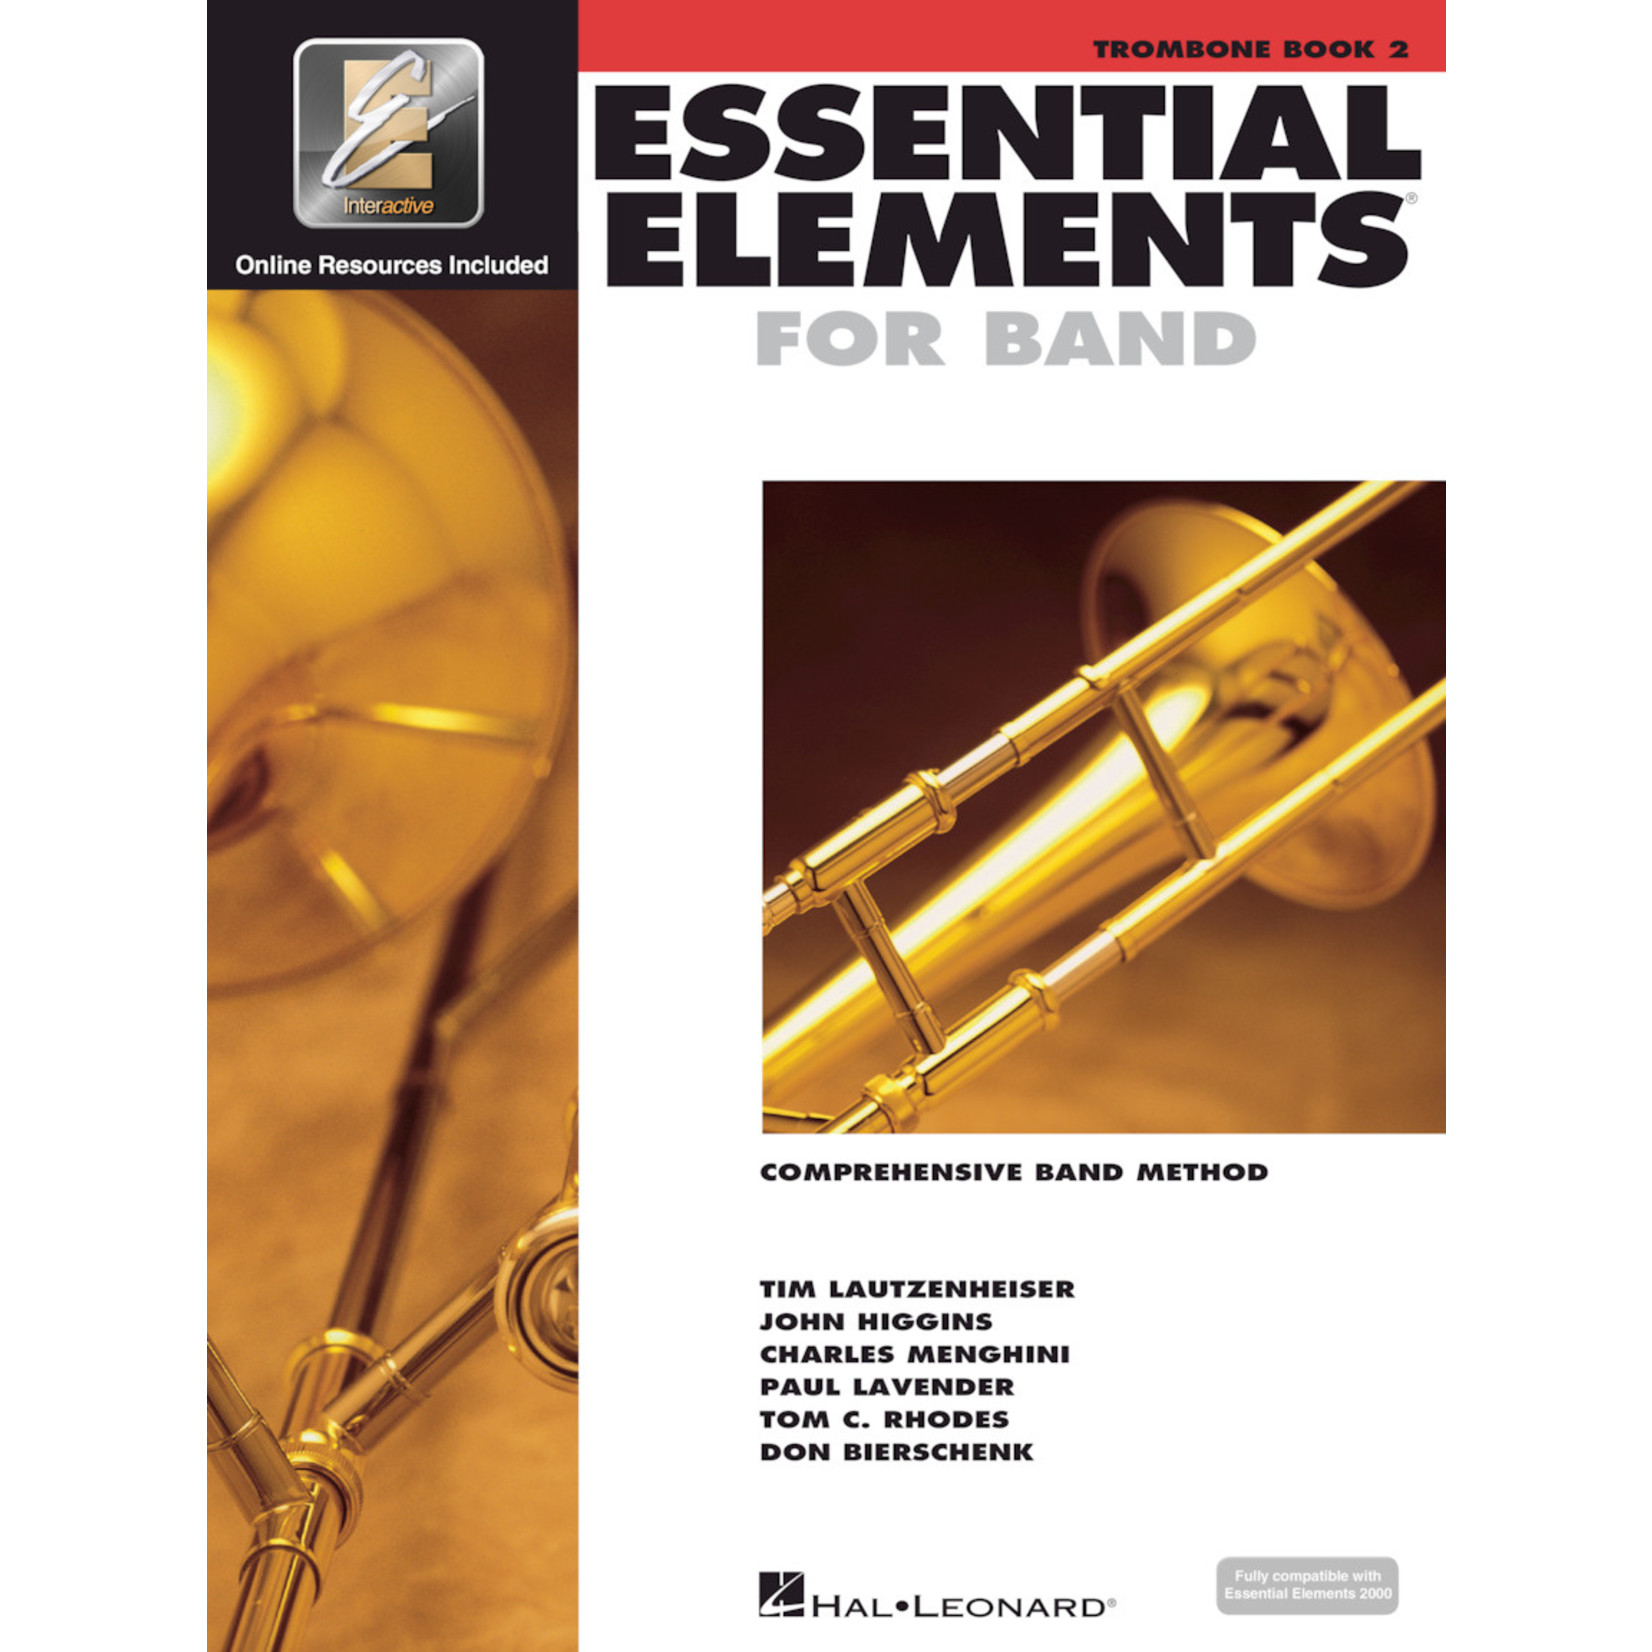 Hal Leonard Essential Elements for Band Trombone Book 2